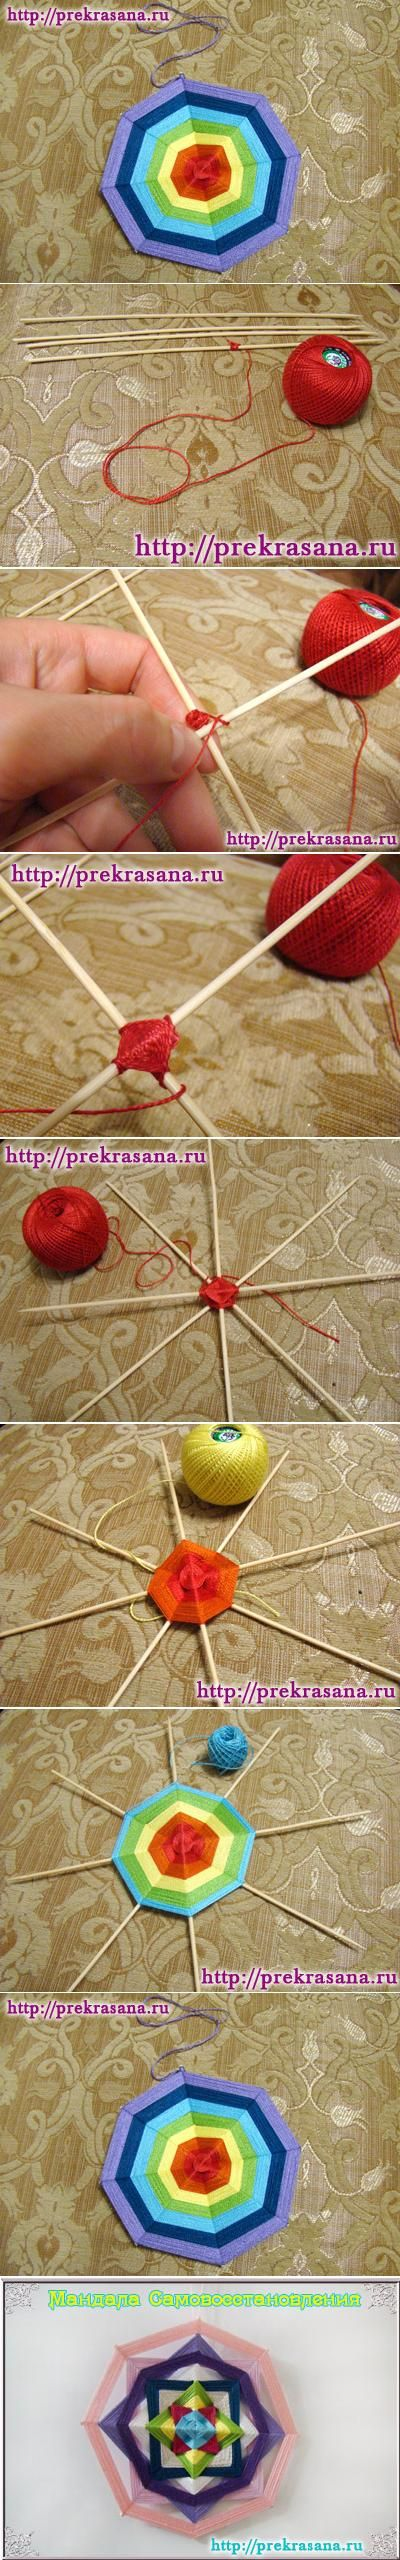 DIY Weave Mandala DIY Weave Mandala